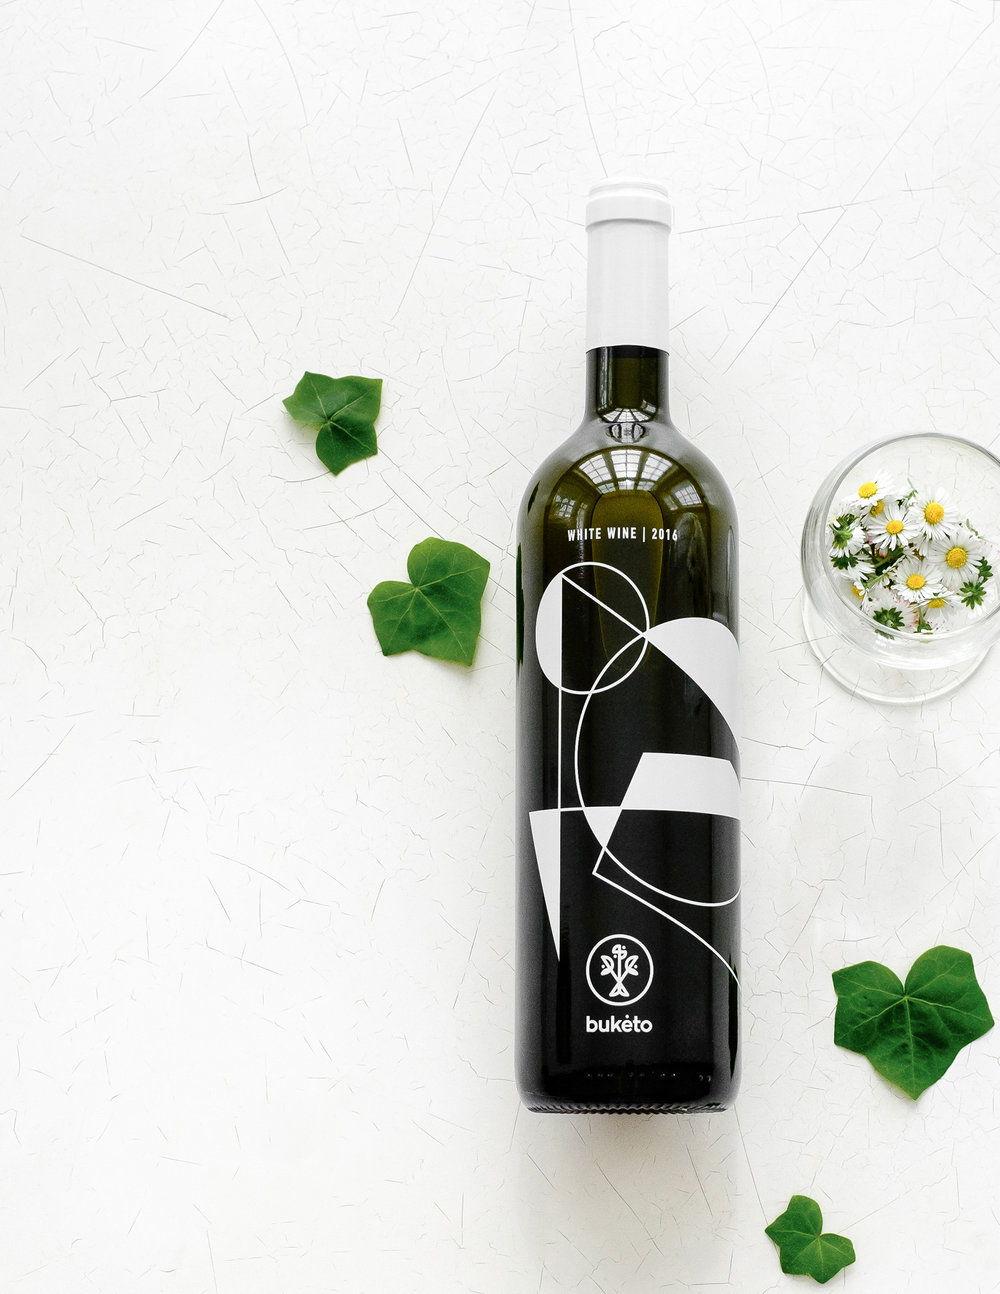 Buketo White wine design by Lazy snail Design